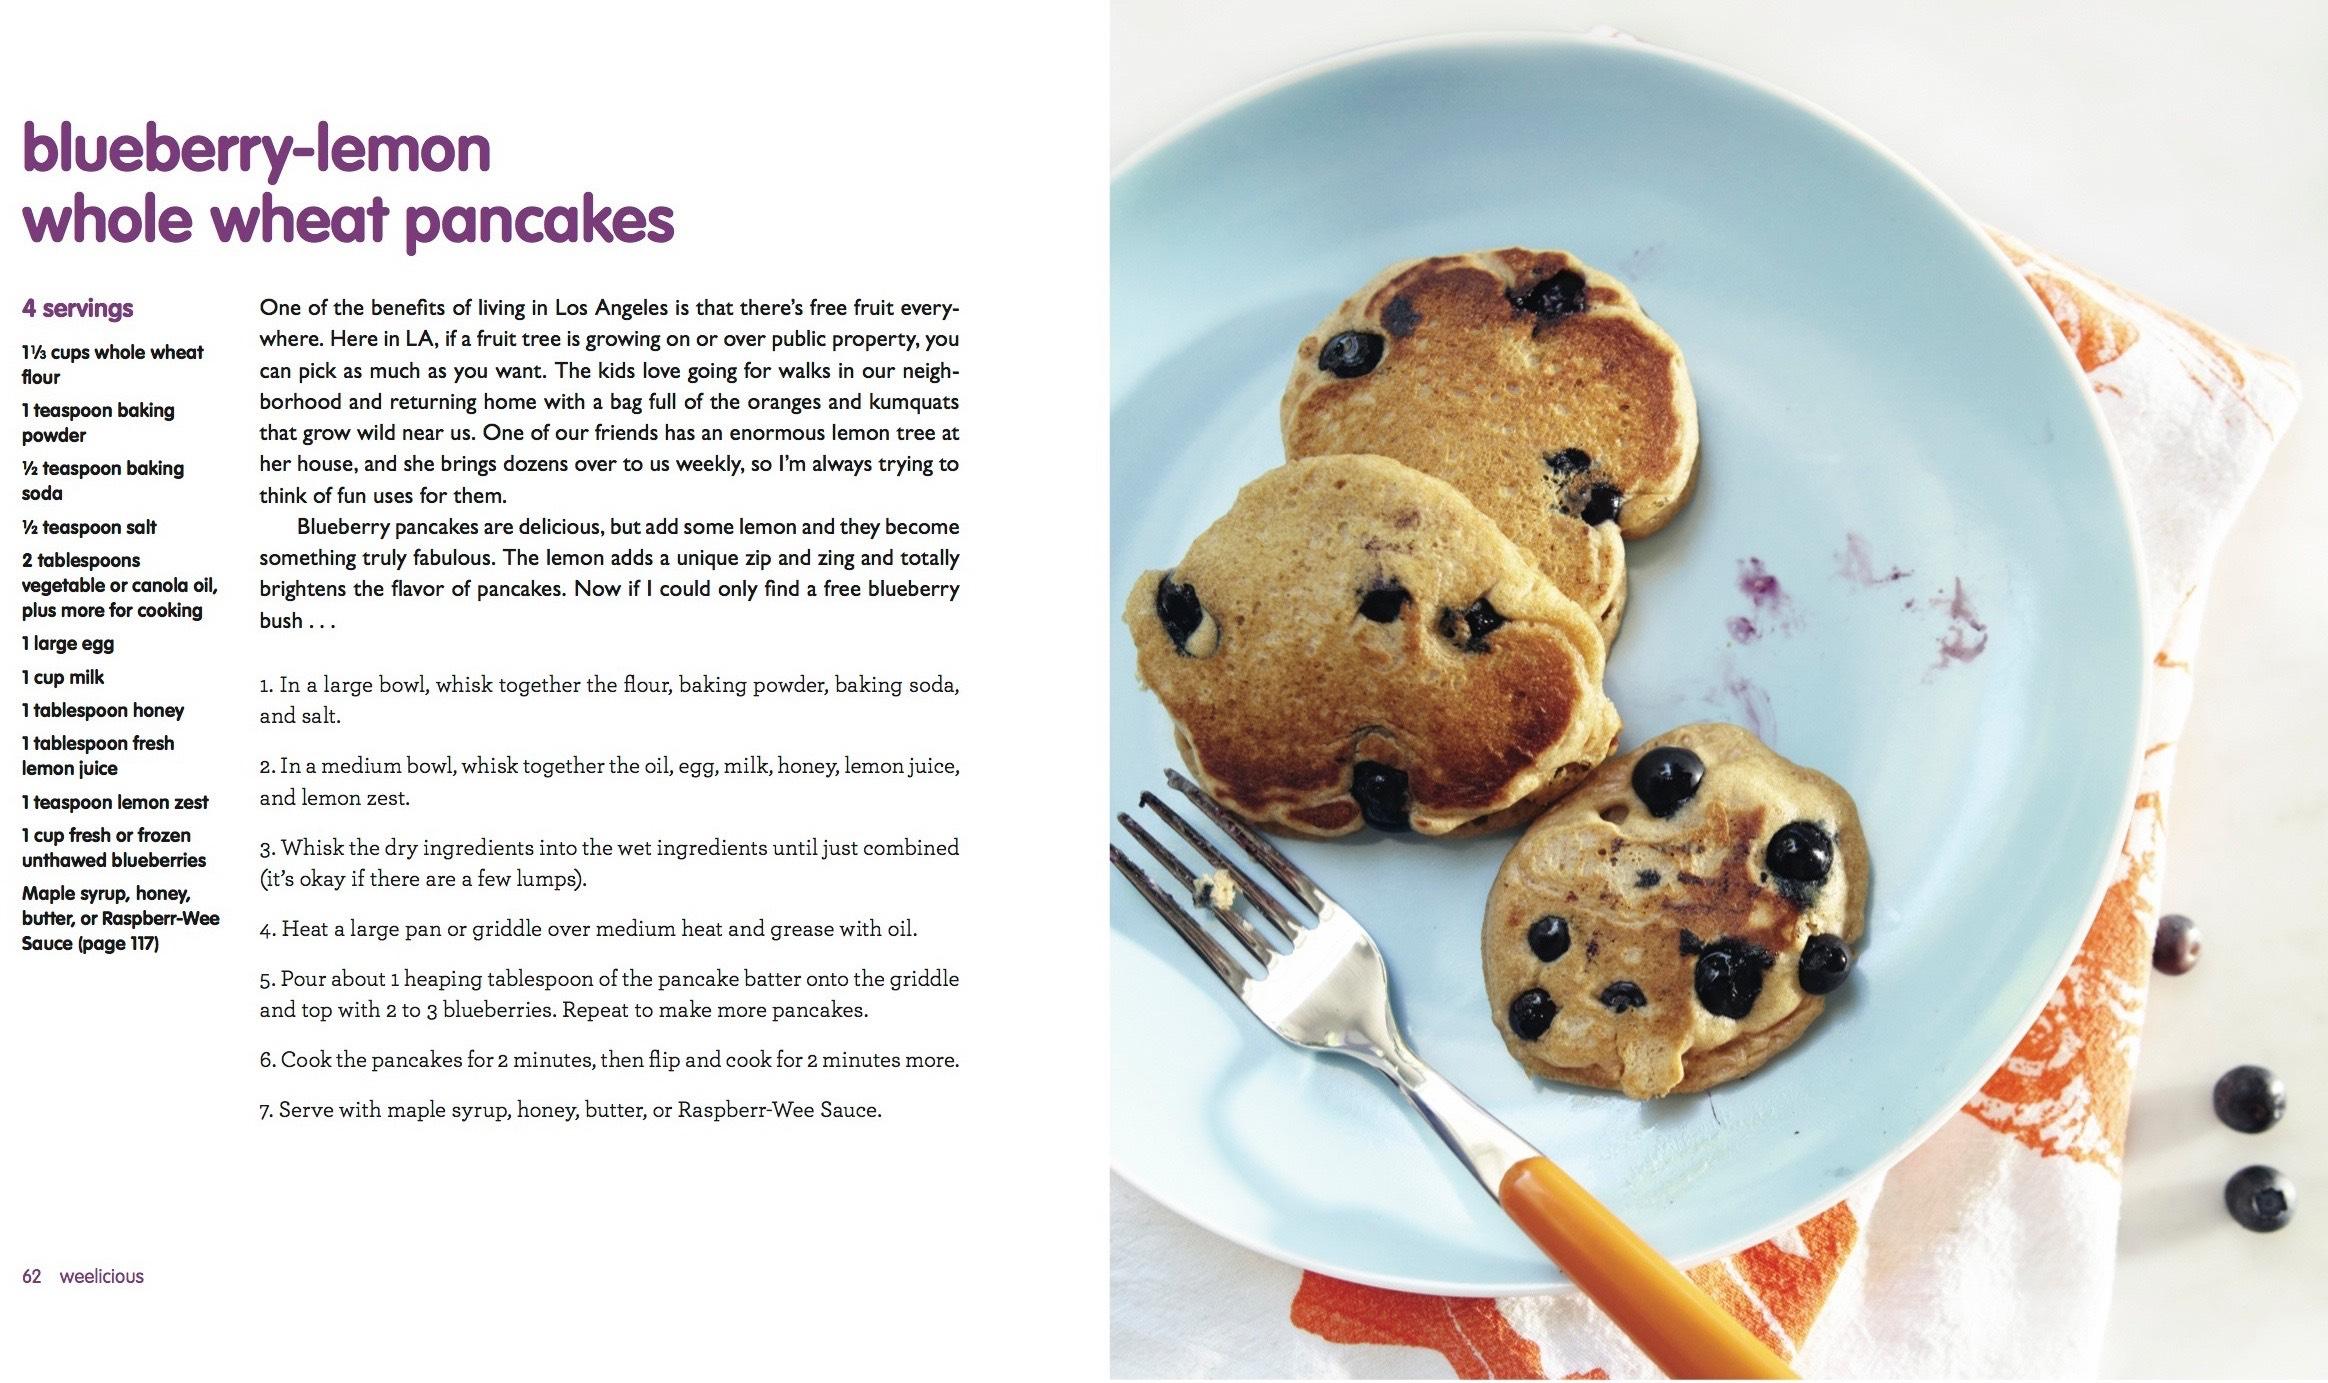 Blueberry Lemon Pancakes from Weelicious